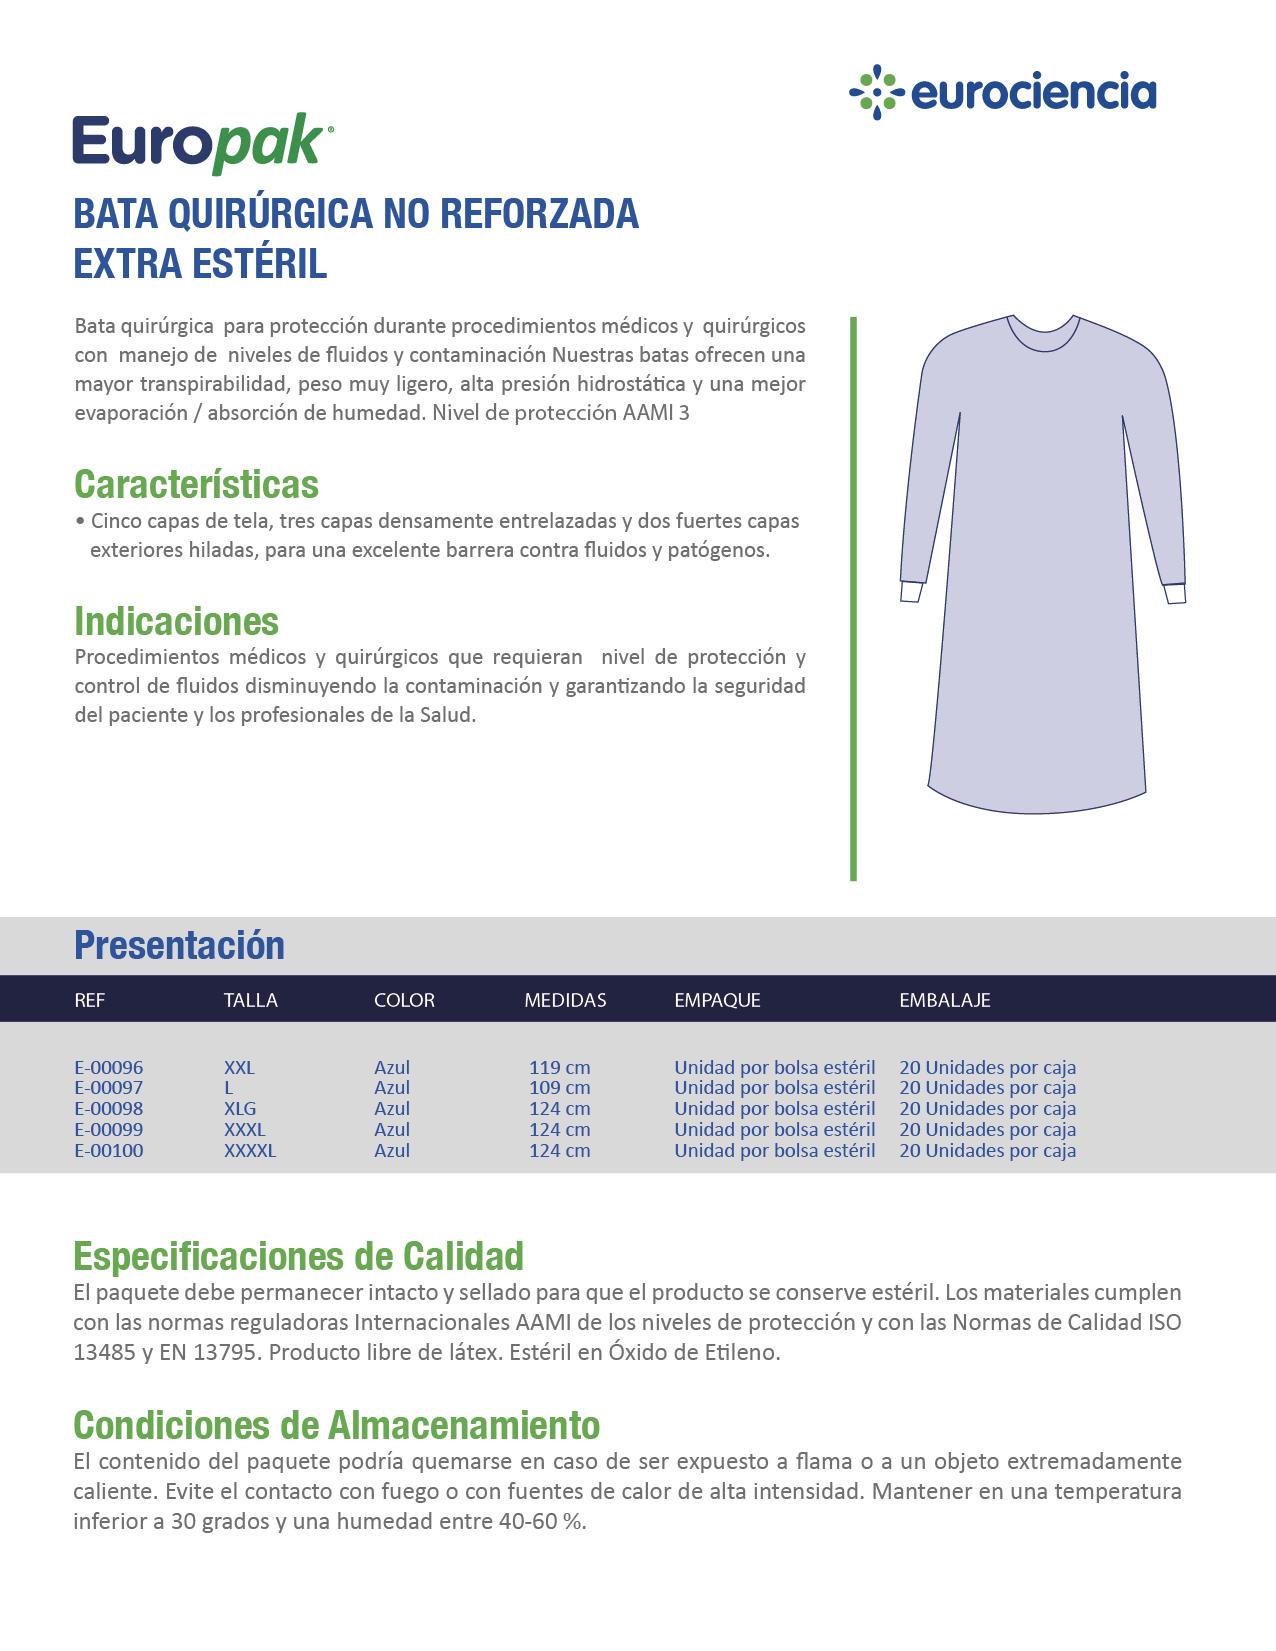 Ropa Quirurgica Descartable Eurociencia Colombia